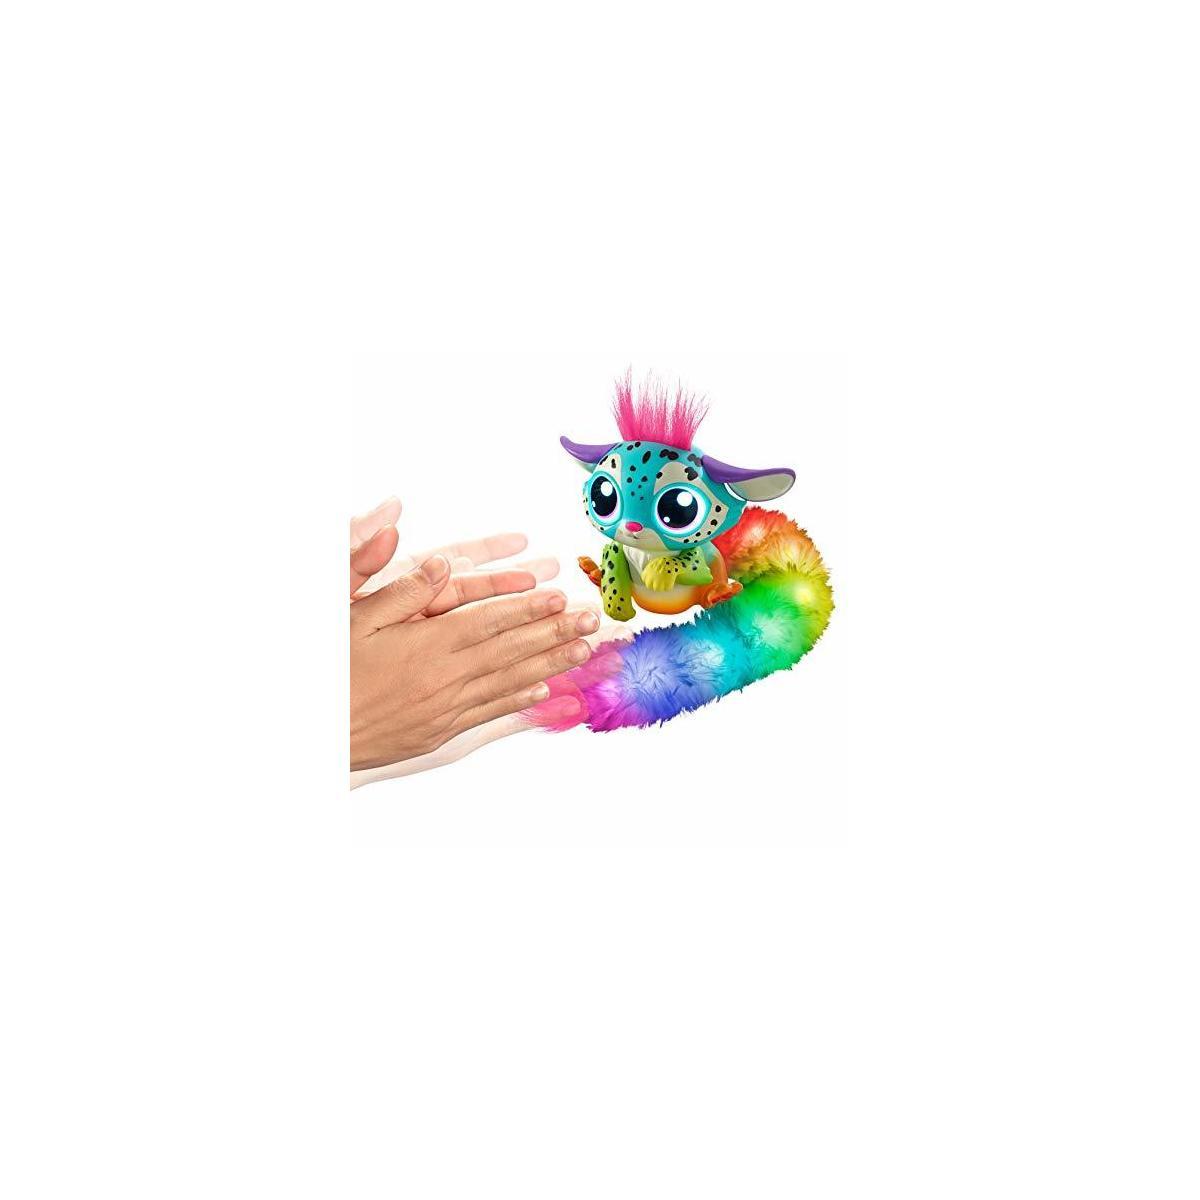 Lil' Gleemerz Rainbow Figure - Amazon Exclusive